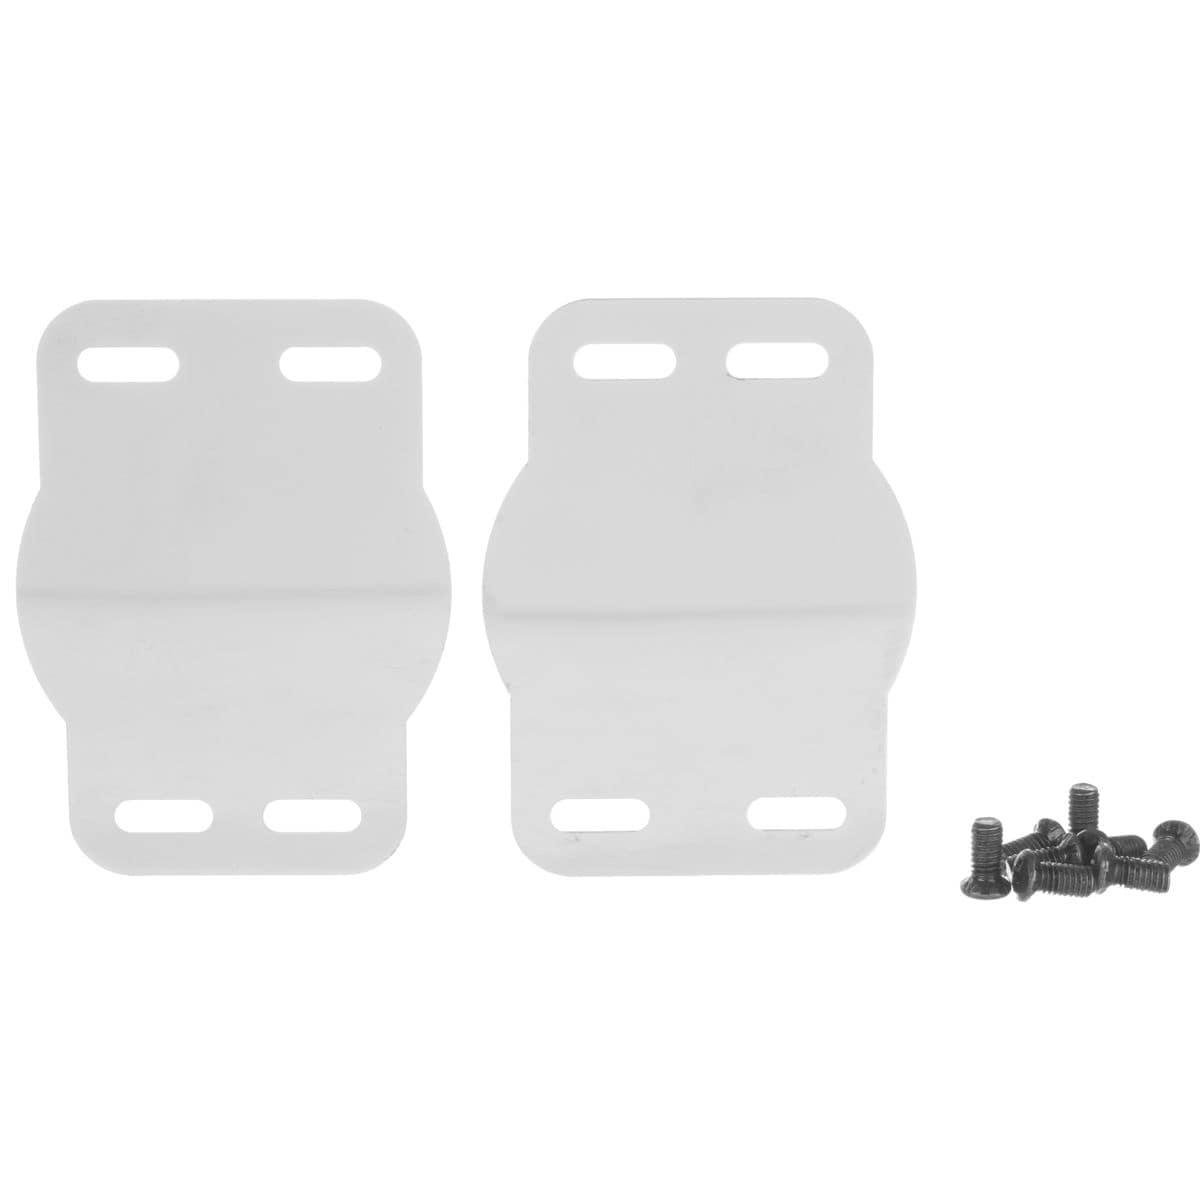 Speedplay Walkable Cleat Protector Shim Kit